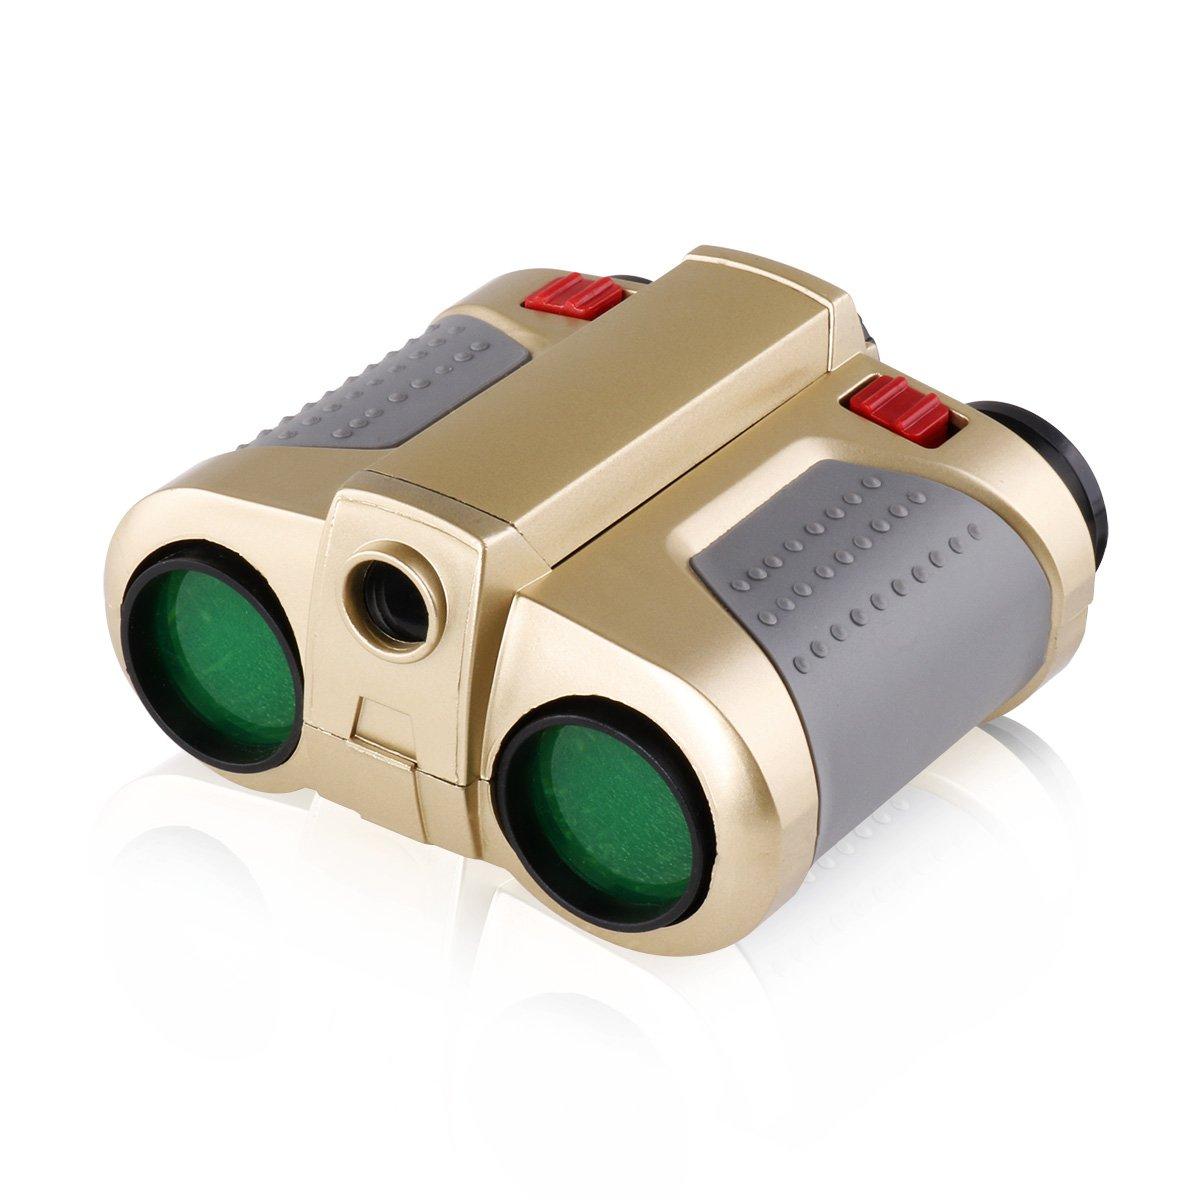 Freebily 4x30 Night Scope Binoculars Telescope with Pop-up Spotlight Fun Cool Toy Gift for Kids Boys Girls